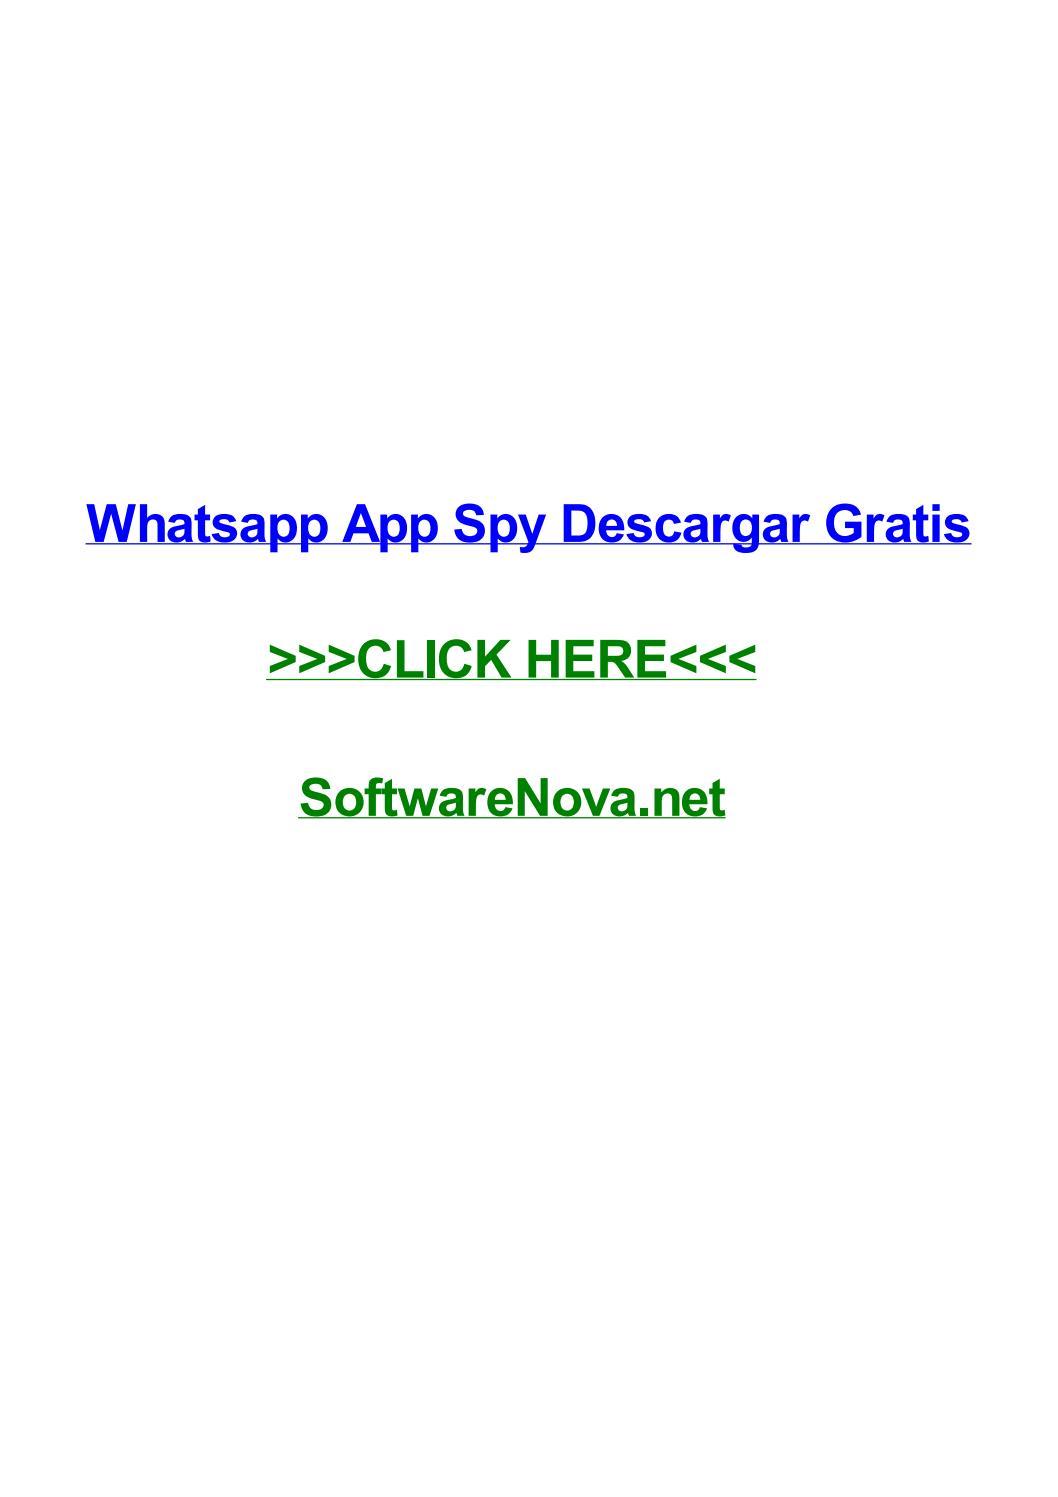 Spy software whatsapp kostenlos